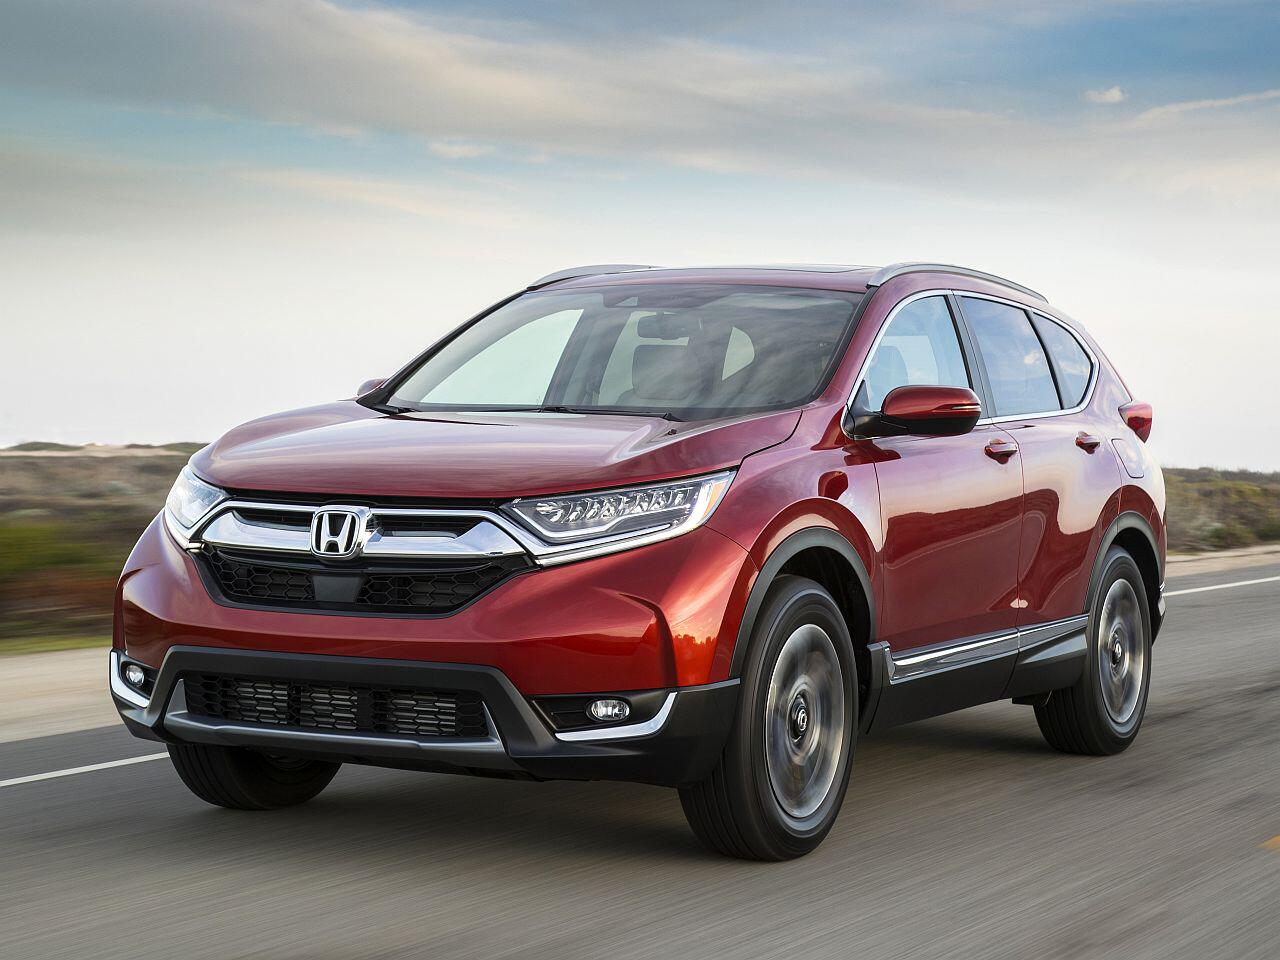 Bild zu Platz 6: Honda-CR-V